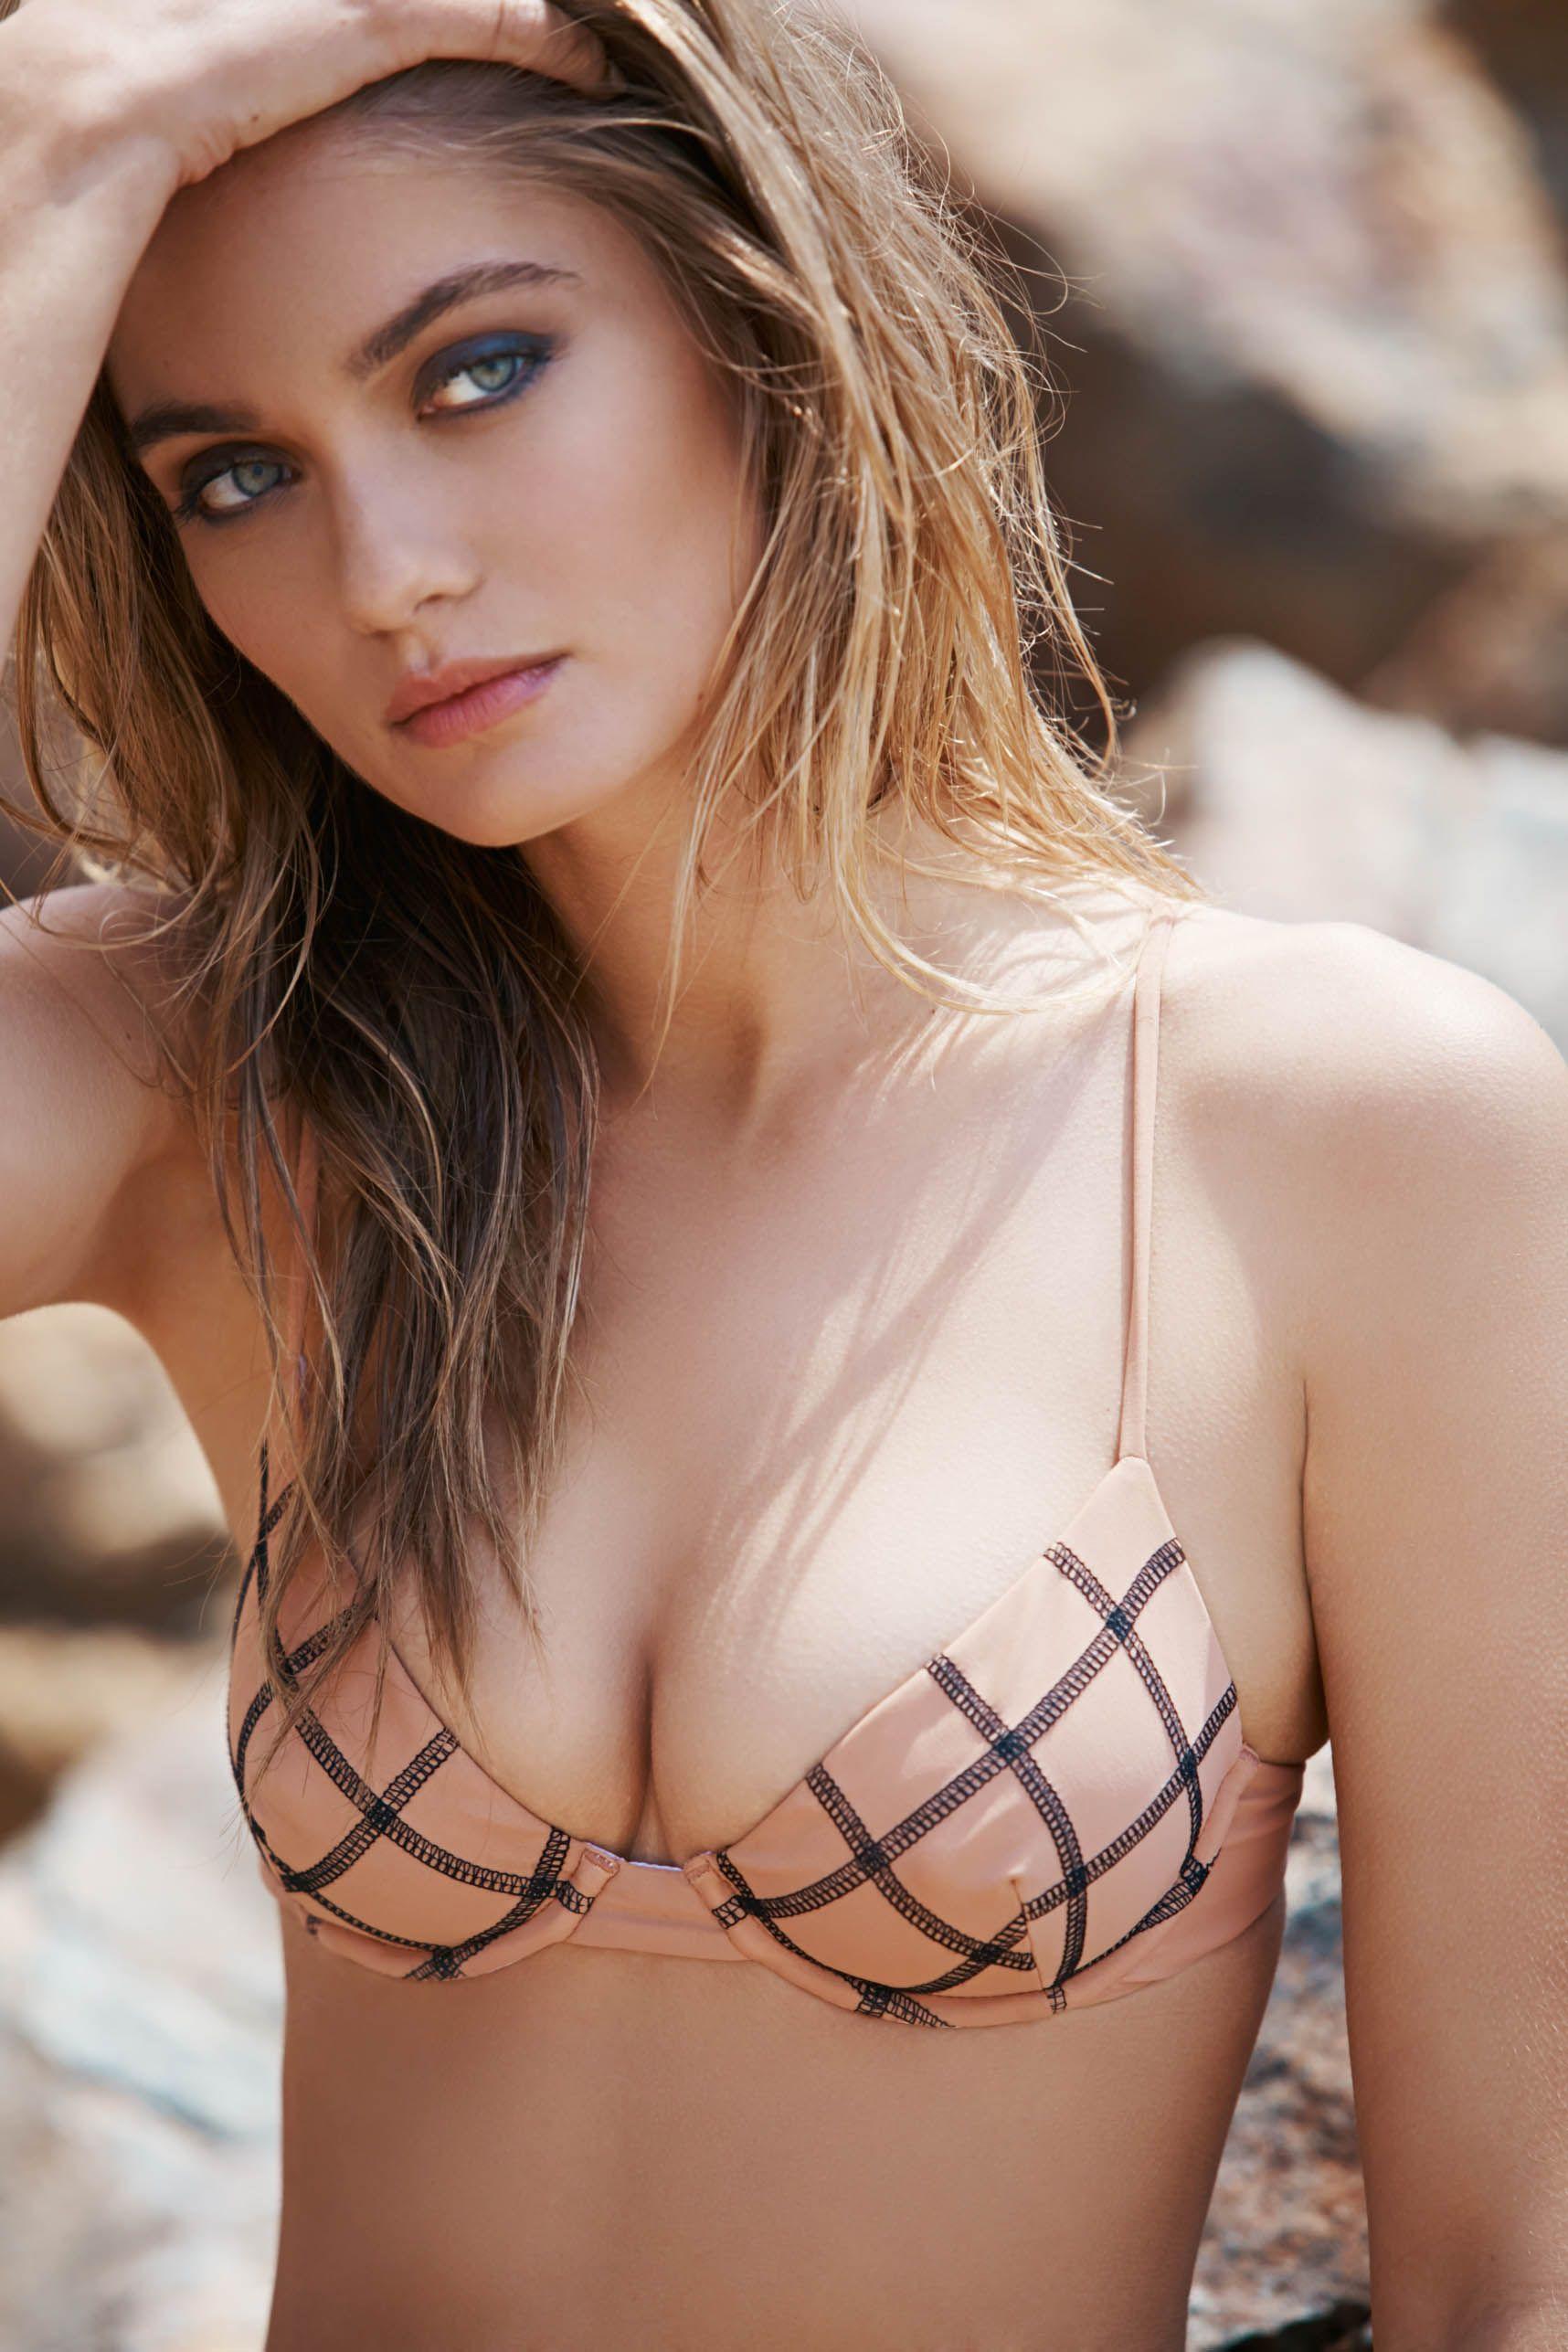 Bikini Butt Natalie Morris  nudes (26 pictures), YouTube, braless